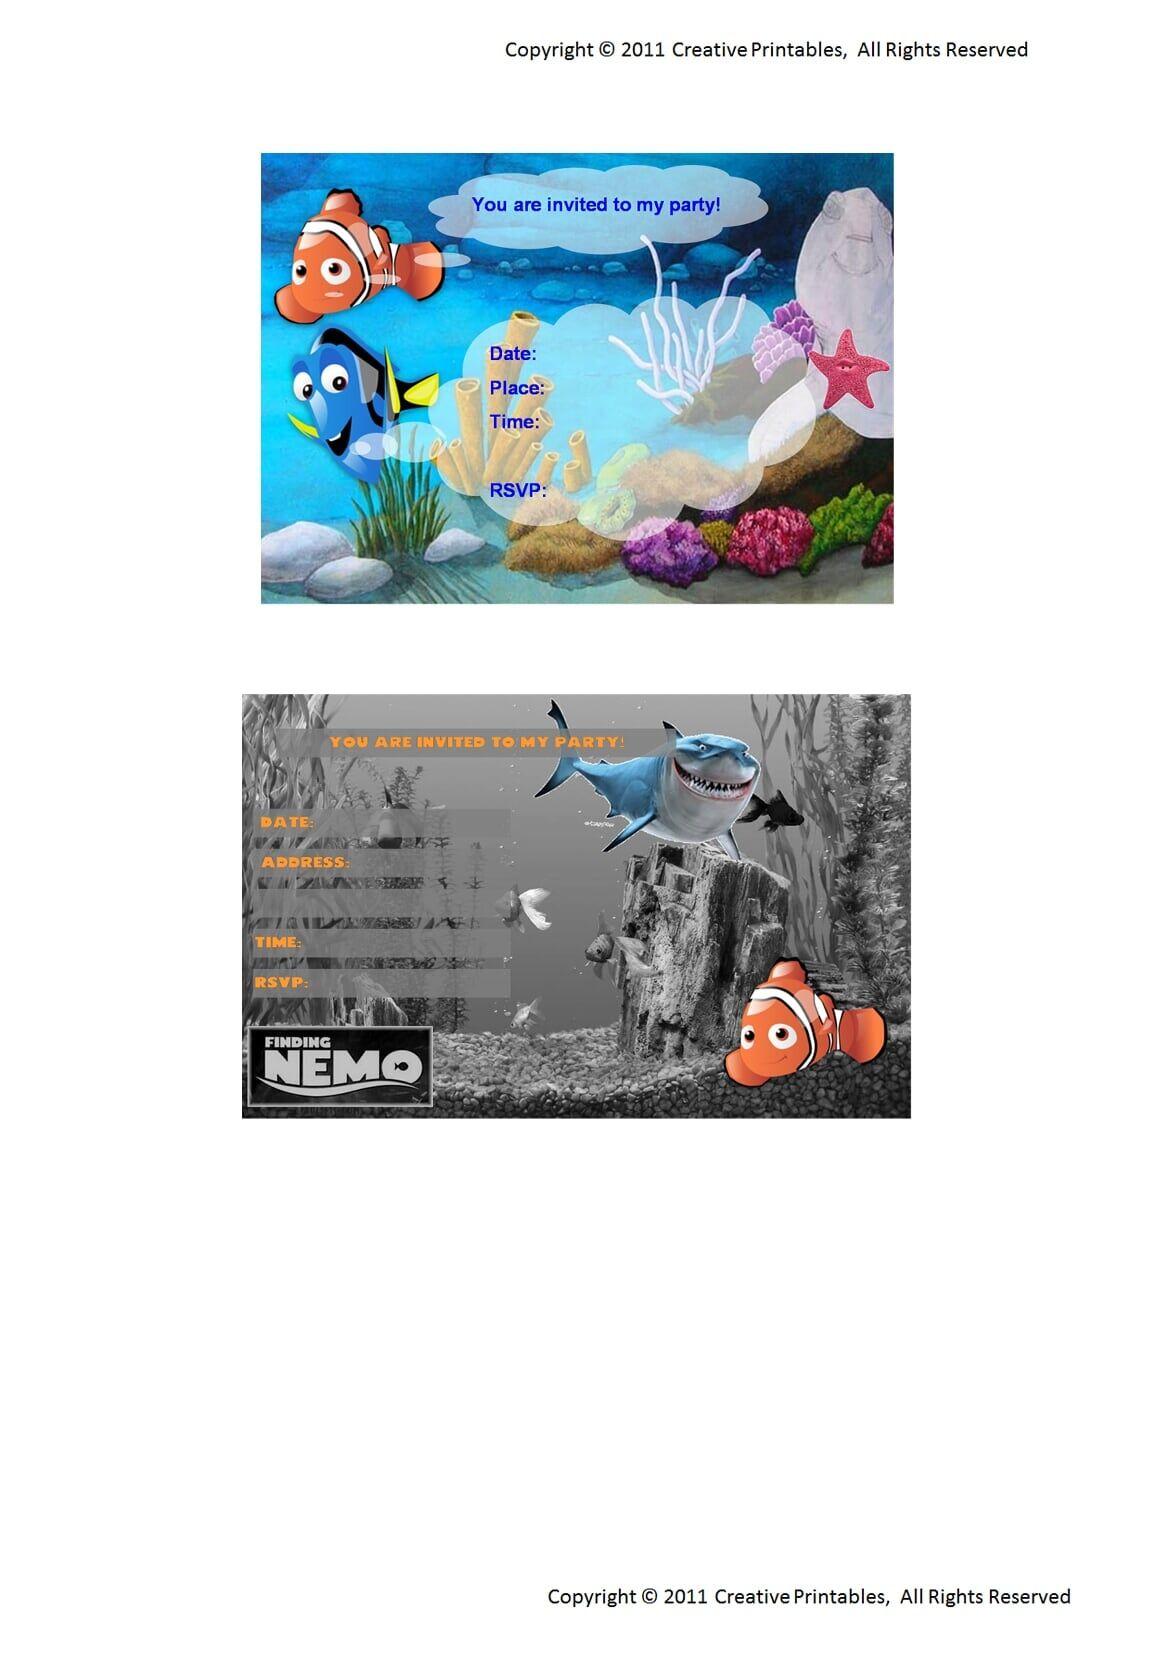 Finding Nemo Extra Invitations.pdf - OneDrive | dory | Pinterest ...